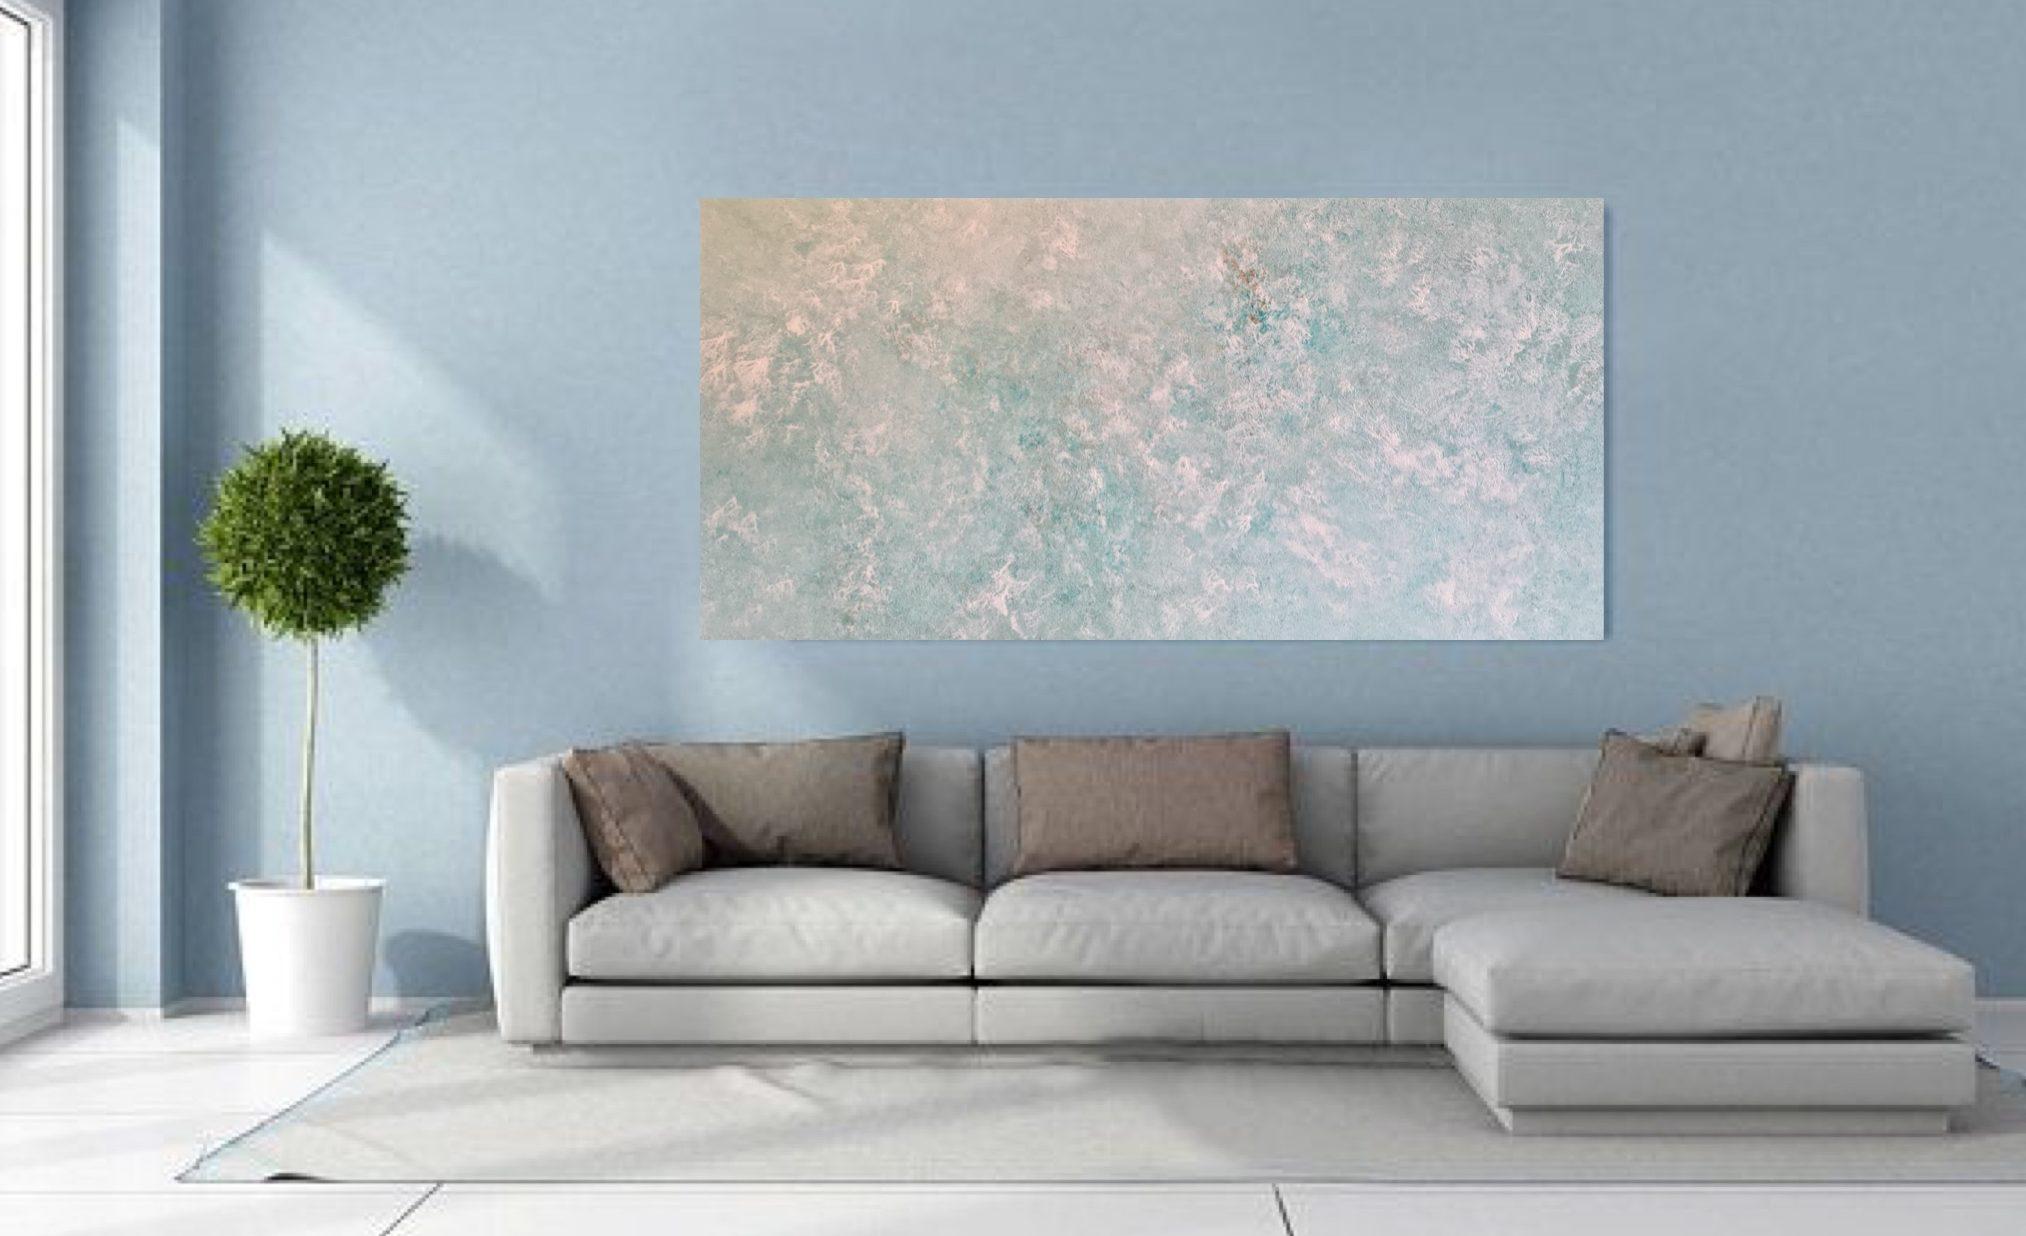 Marine Bonzom - Artiste Peintre Biarritz - Home - Bel Air